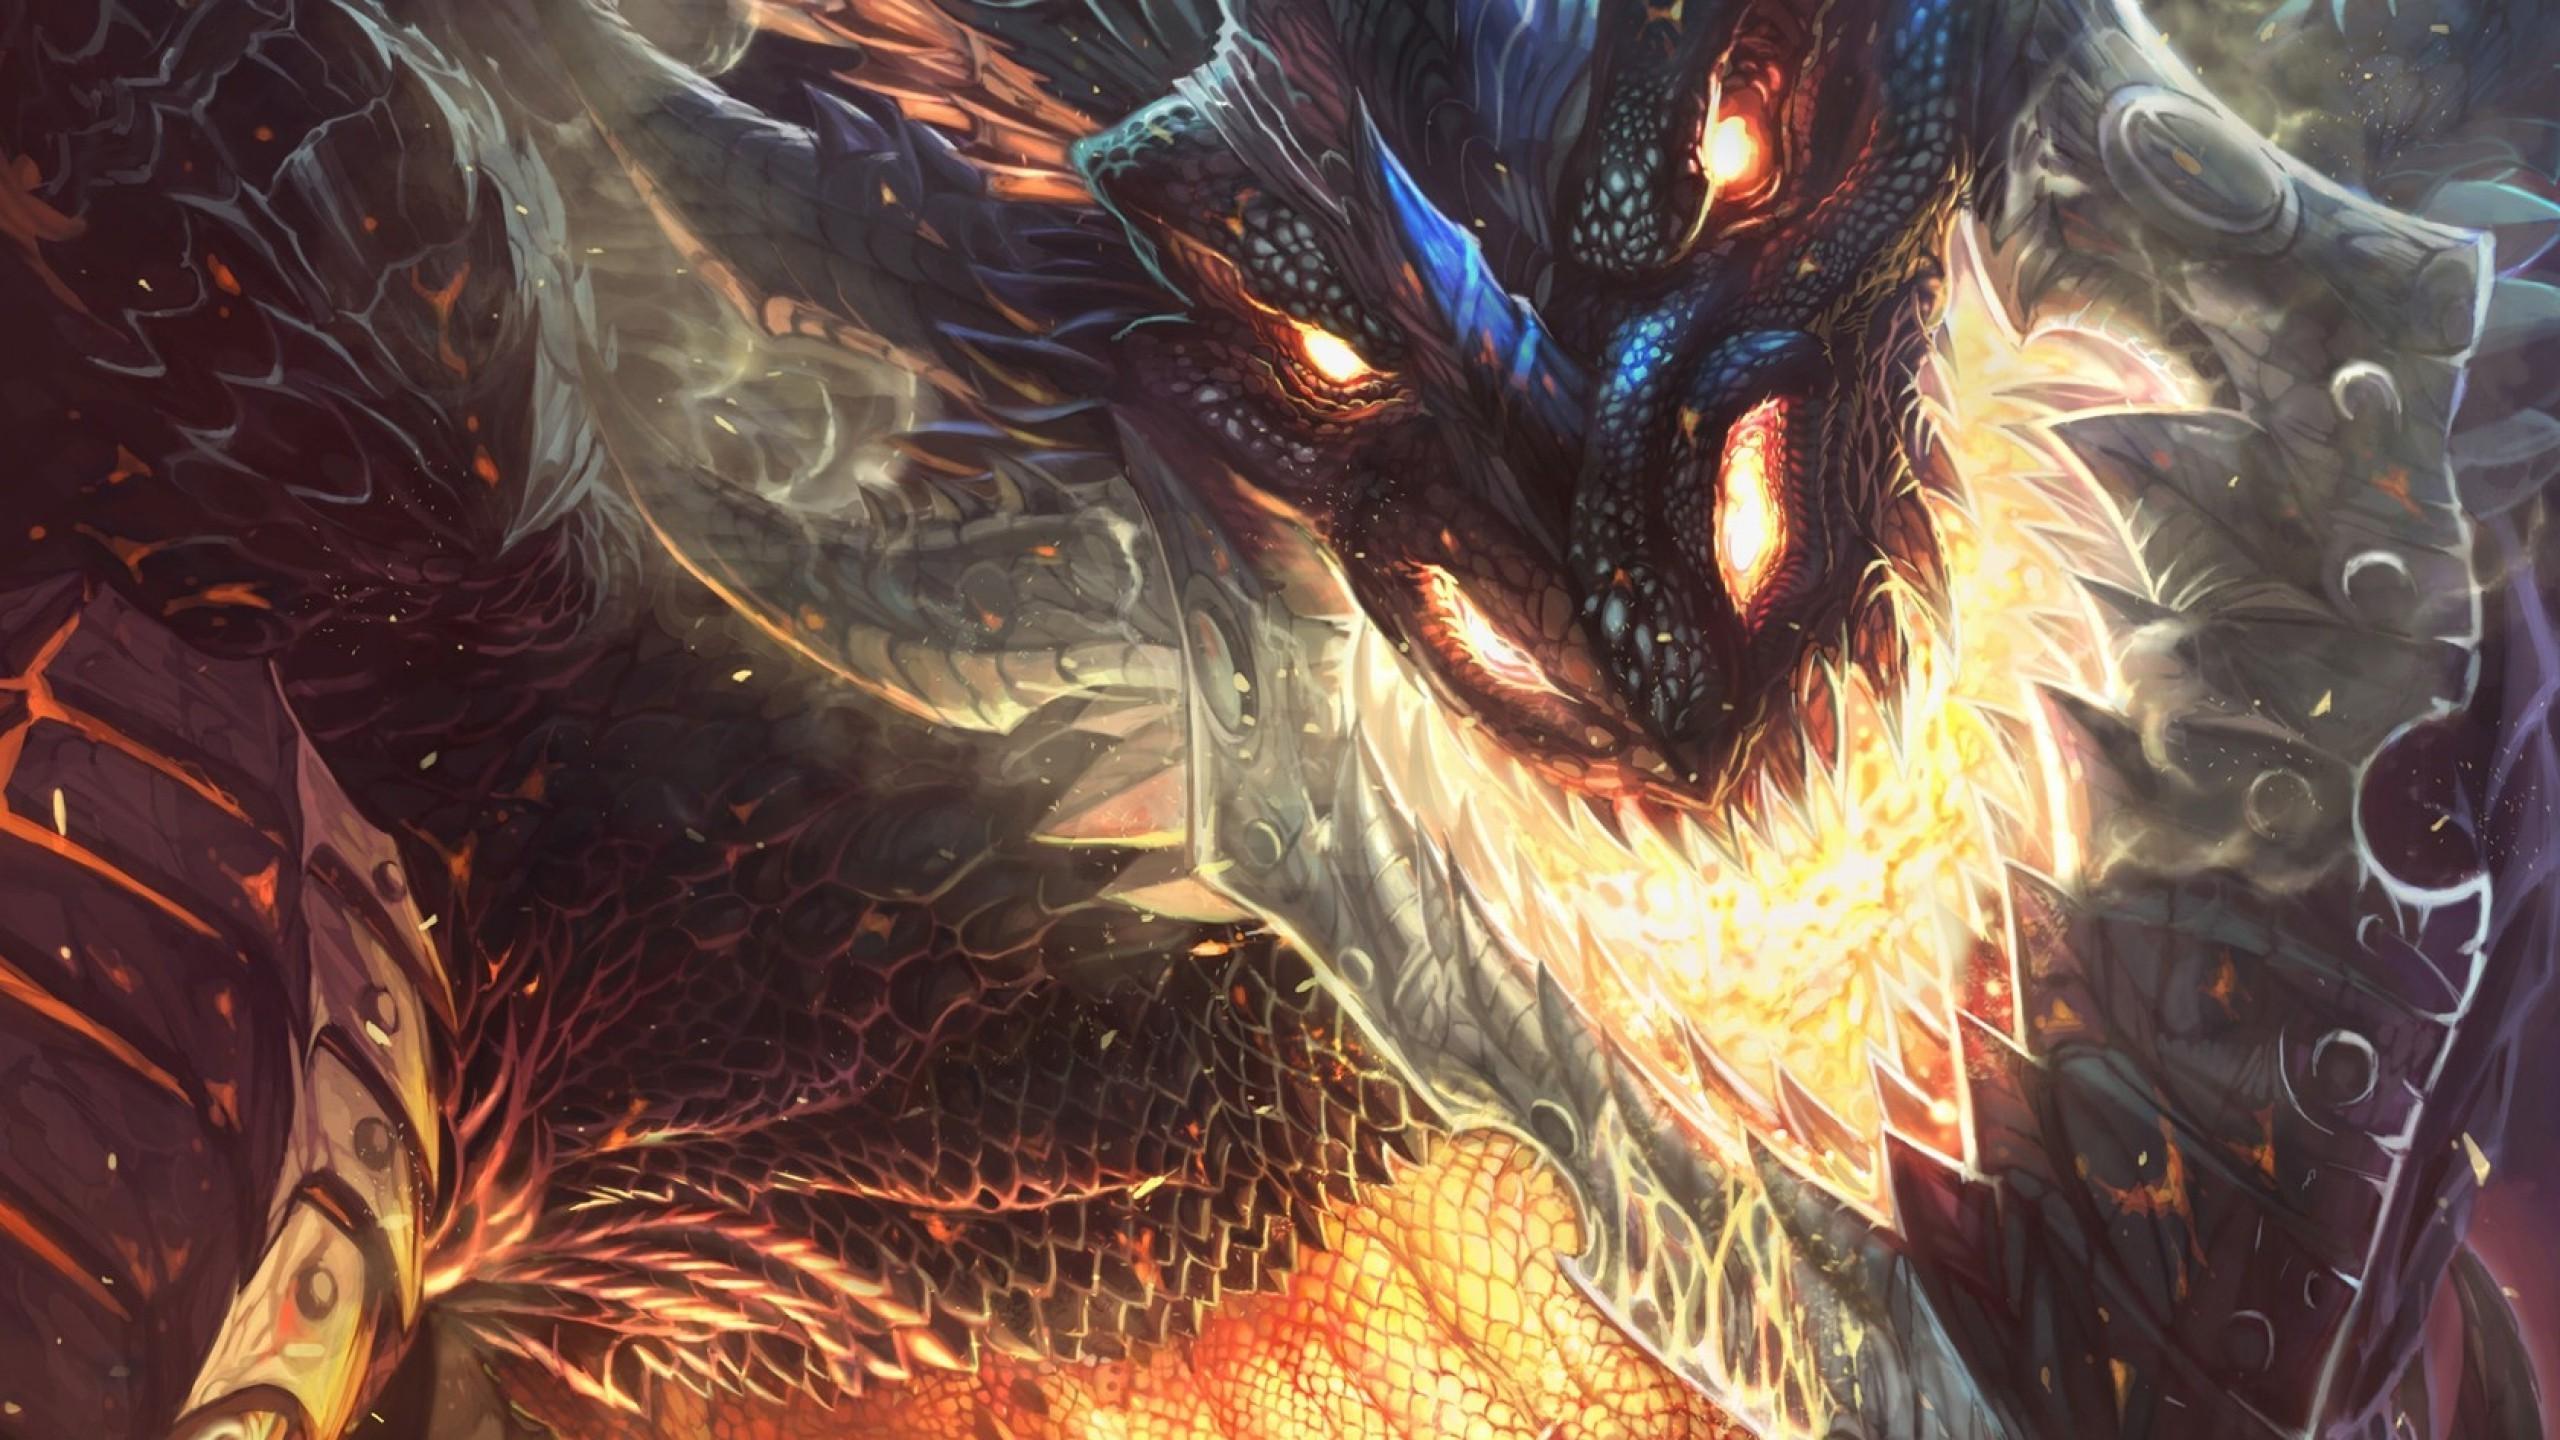 Wallpaper 2560x1440 Px Deathwing Dragon World Of